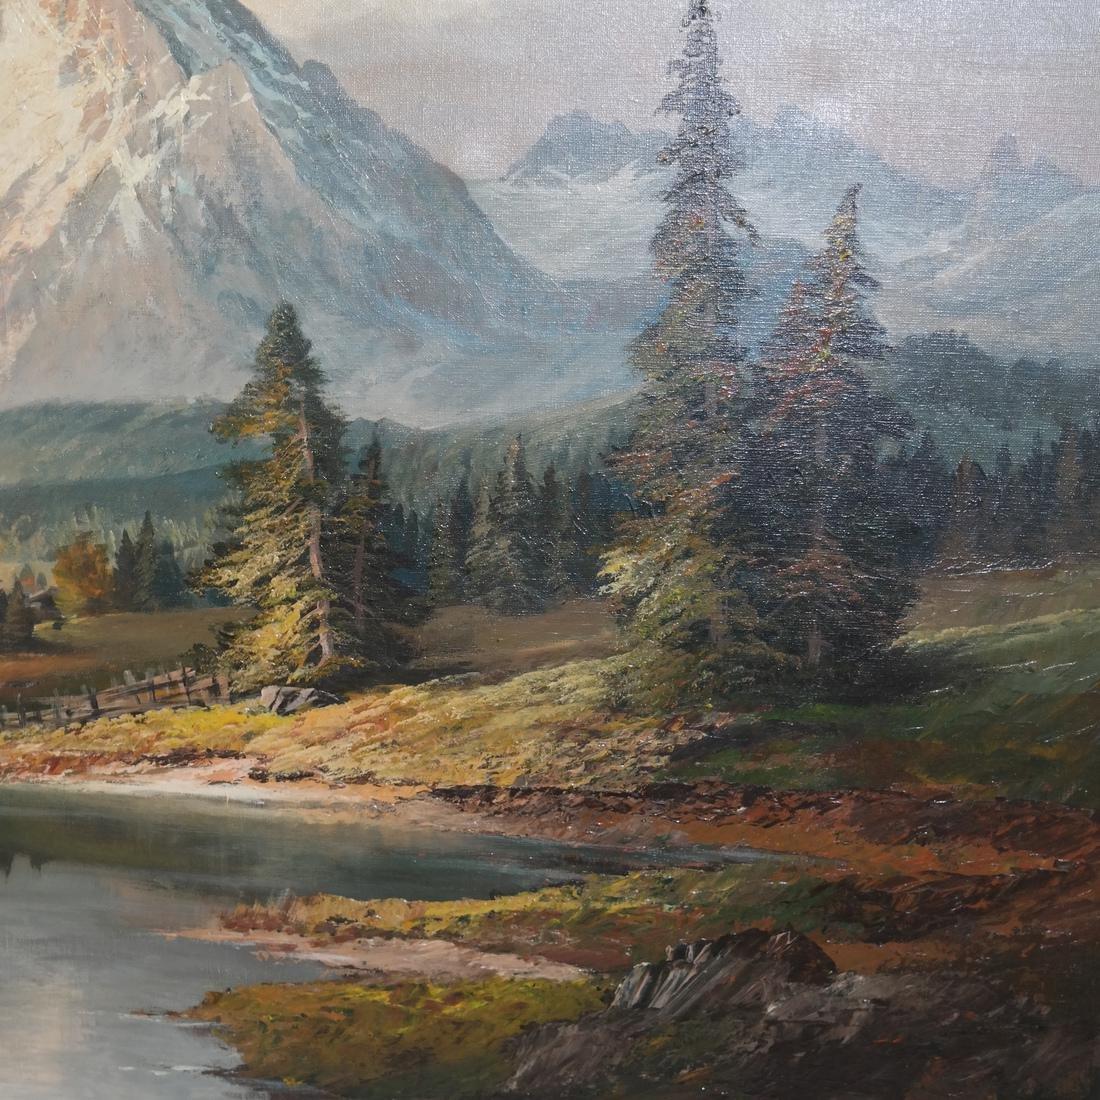 Mountain, River Landscape - O/C - 3